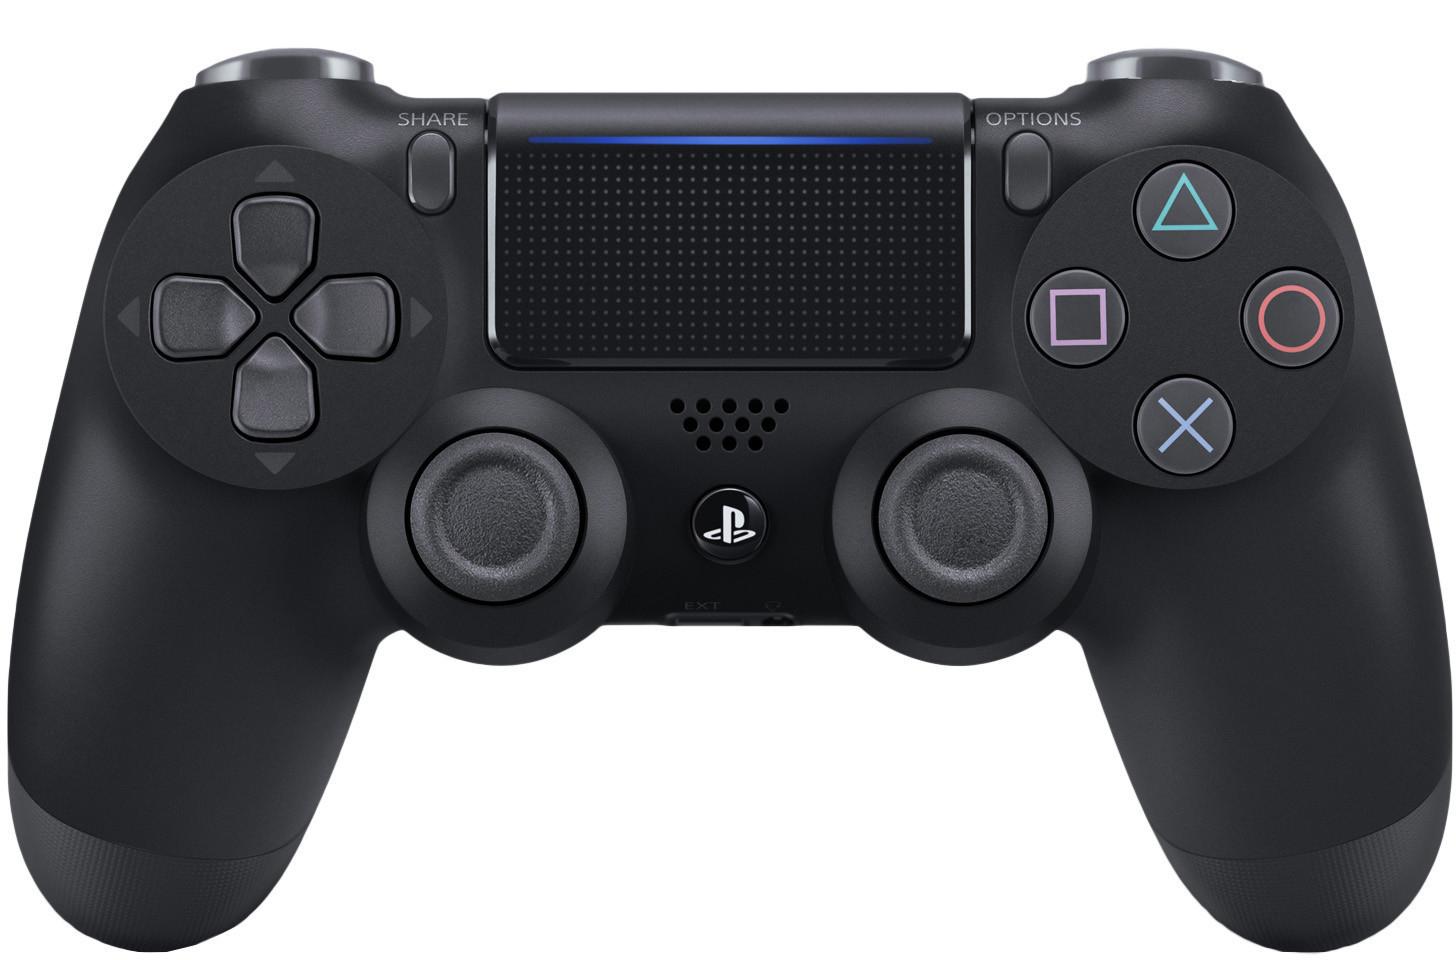 Battlefield V + Just Cause 4 + Fallout 76 + Playstation 4 Controller für 106,32€ (Media Markt)